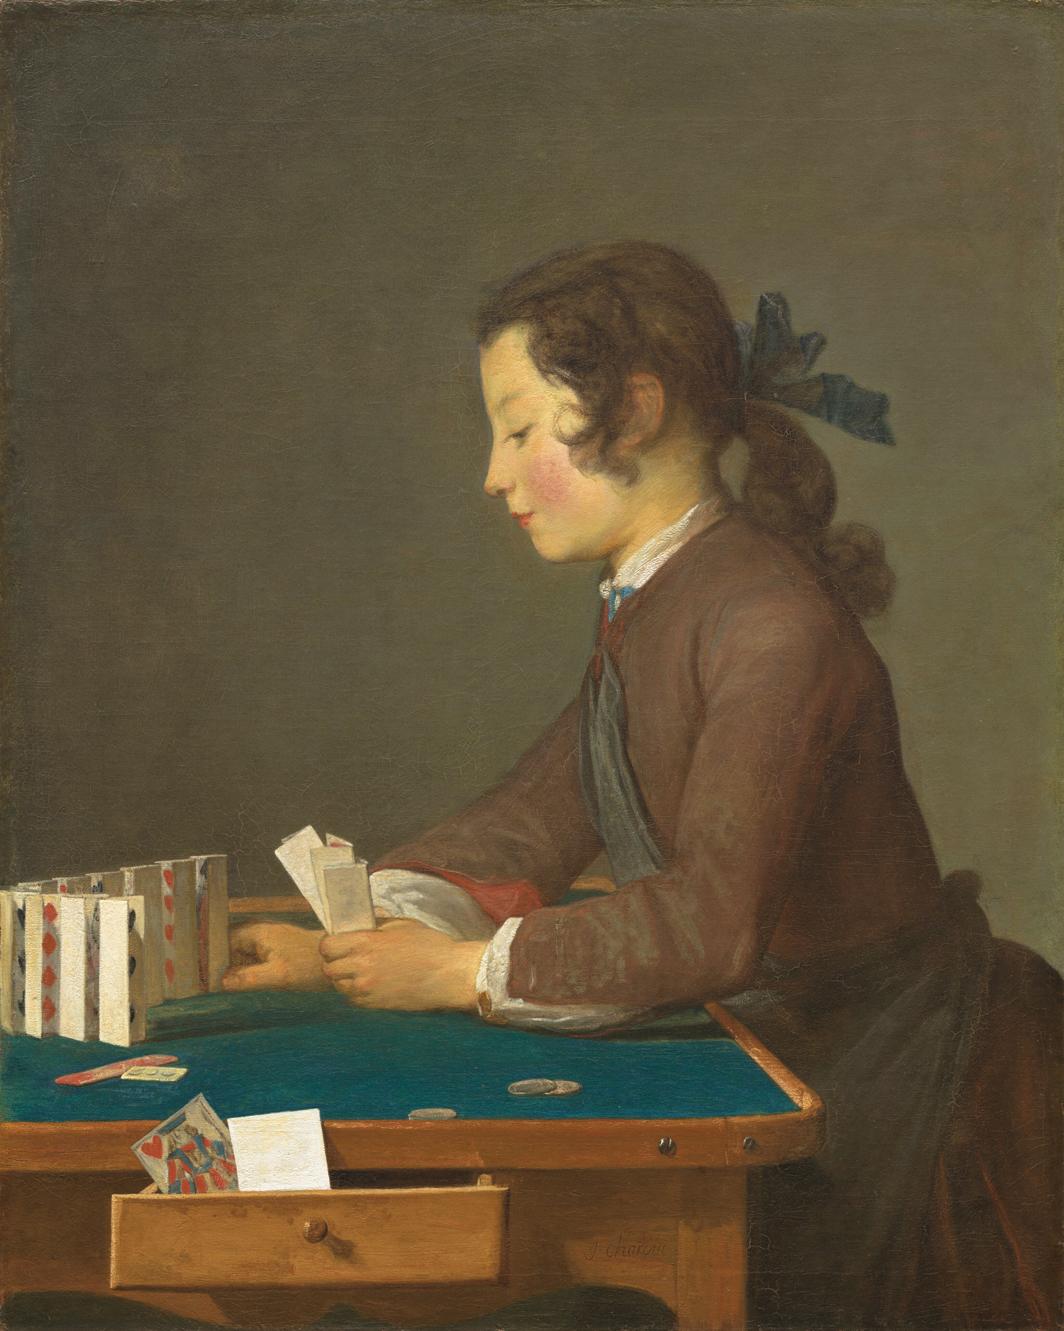 Jean-Baptiste-Siméon Chardin, Le château de cartes (The House of Cards), 1737, oil on canvas, 32 3⁄8 × 26